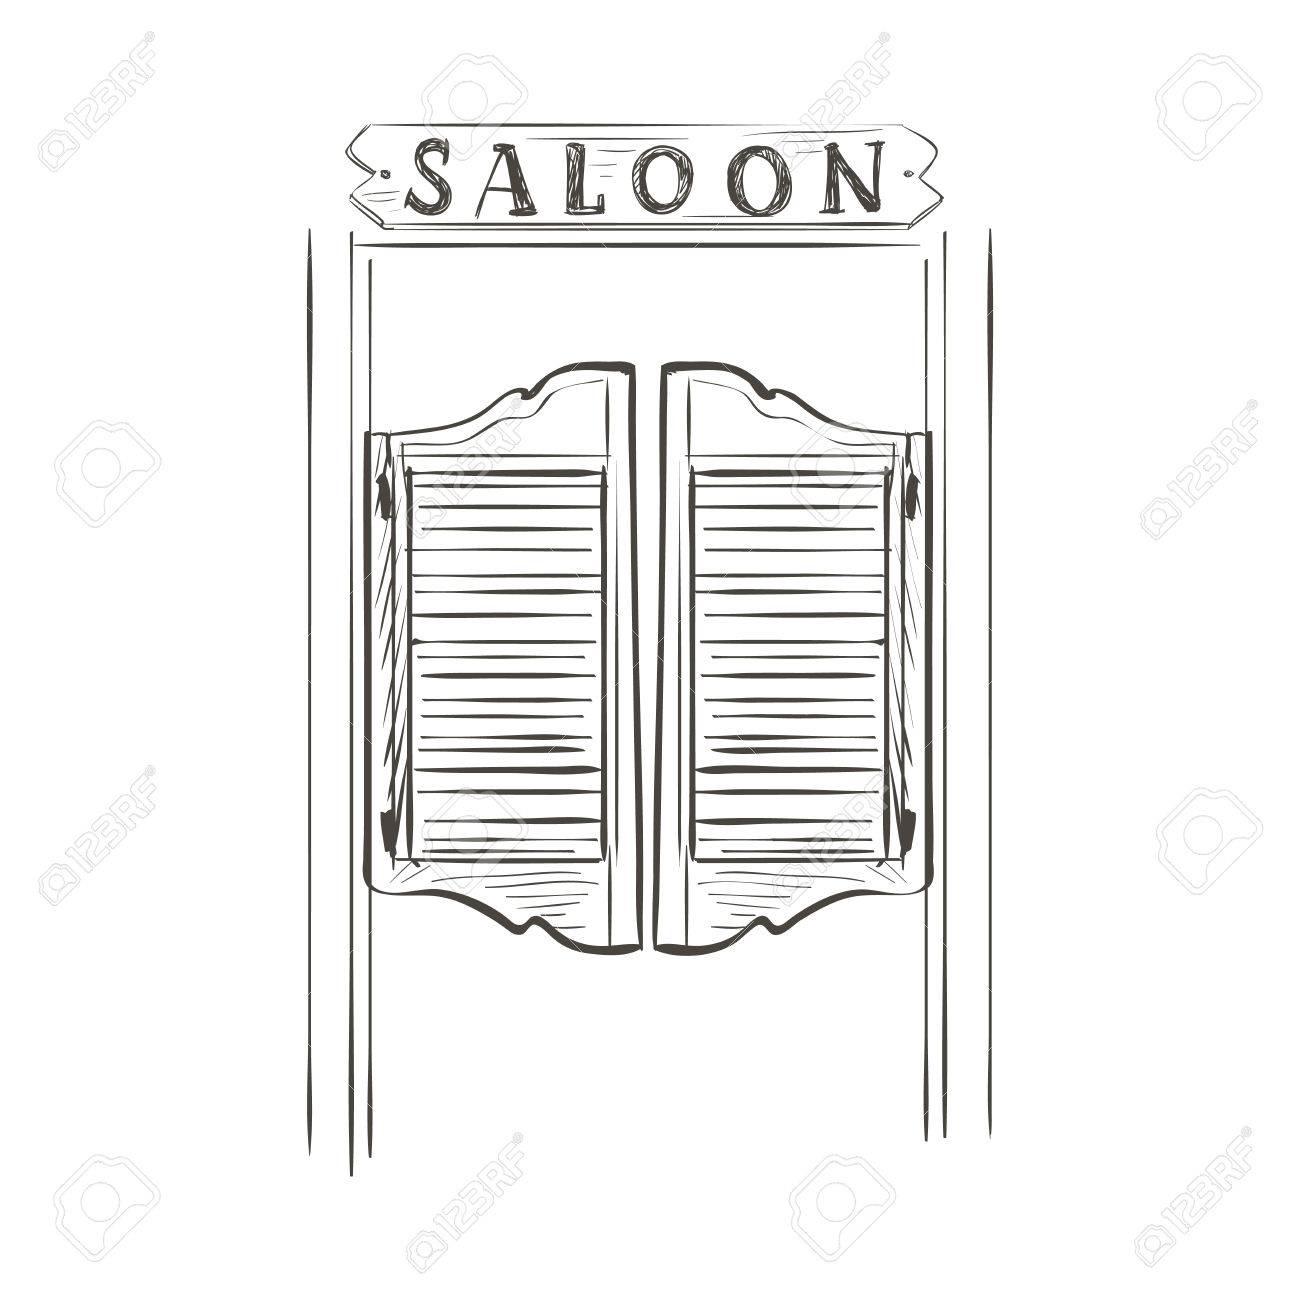 Old western swinging saloon doors. Doodle style Stock Vector - 44893928  sc 1 st  123RF.com & Old Western Swinging Saloon Doors. Doodle Style Royalty Free ...